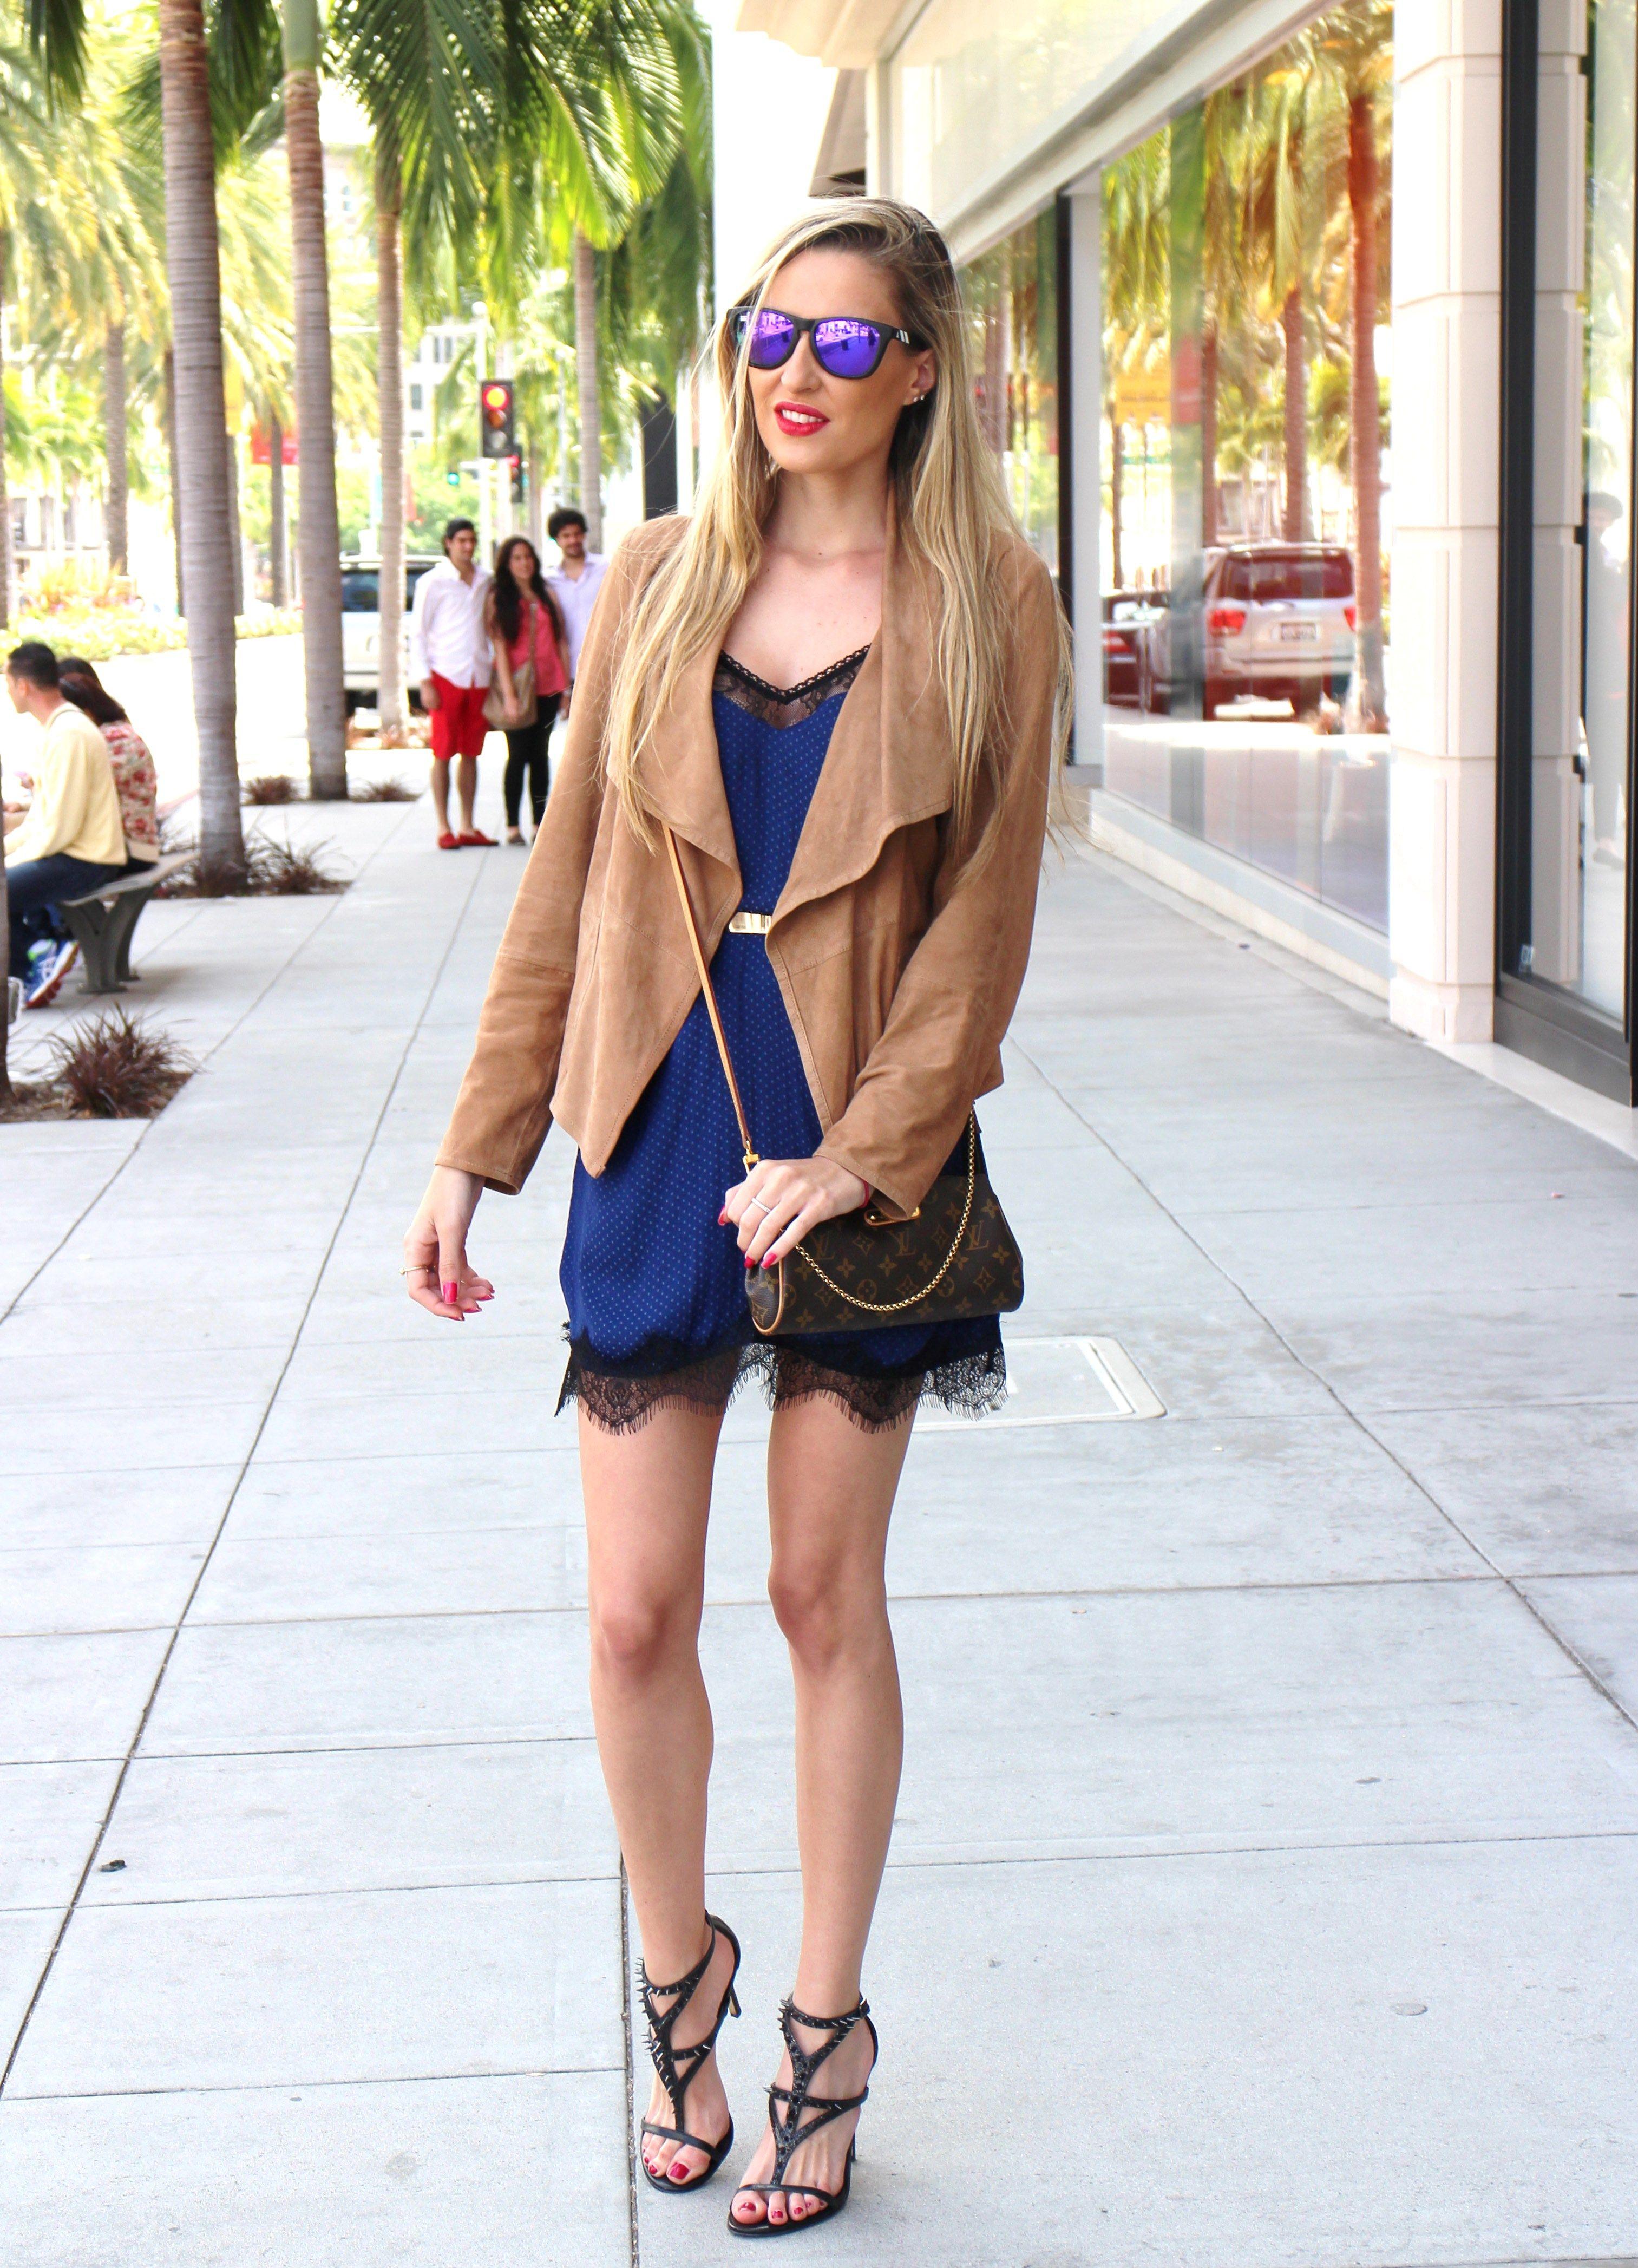 Rodeo Drive 16-4-2014  Dress: Stradivarius / Sandals: Guess / Belt: Asos / Sunnies: Blenders / Bag: Louis Vuitton / Jacket: Mago